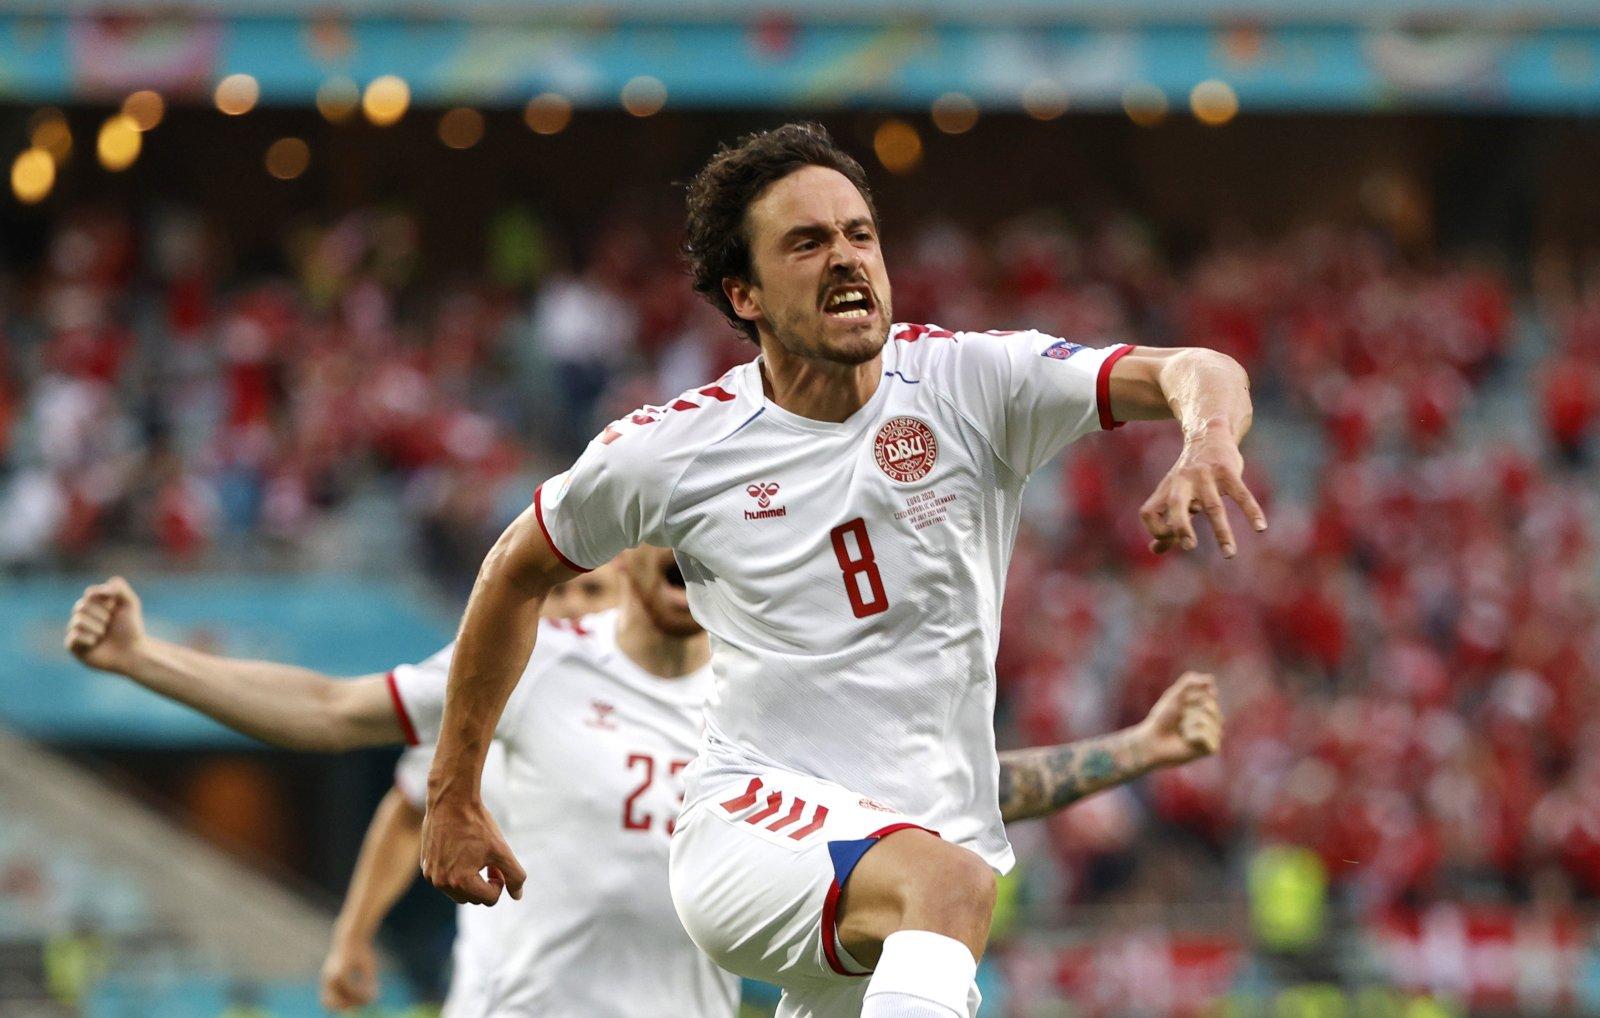 Roma consider Borussia Dortmund midfielder Delaney as talks with Arsenal for Xhaka falter